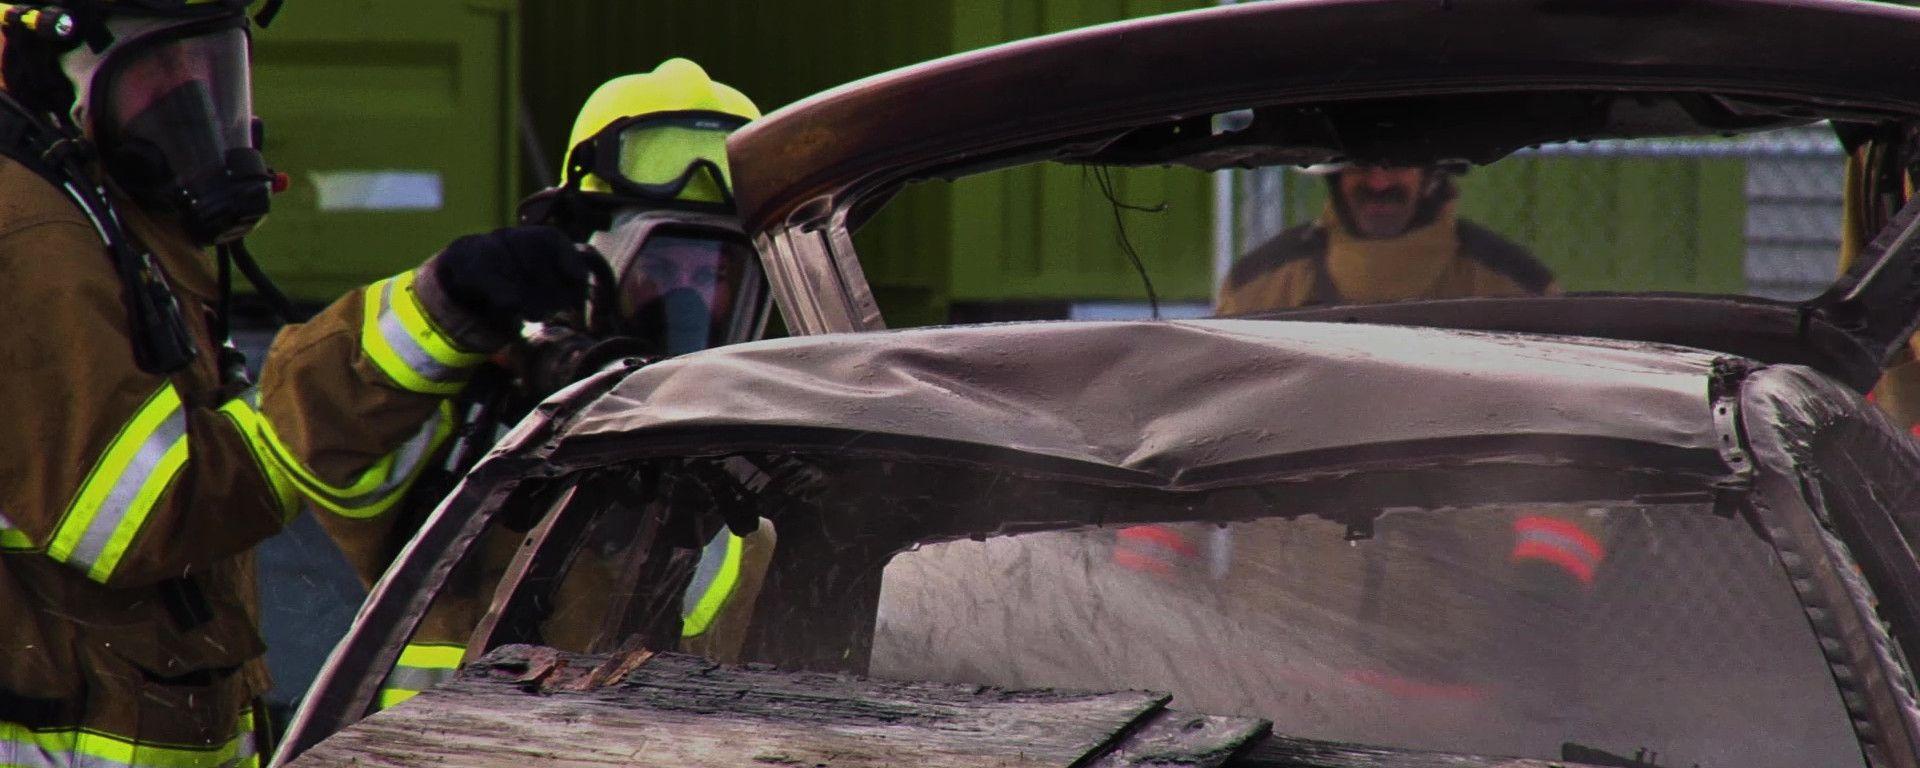 Euro Rescue, app di Euro NCAP per i soccorritori